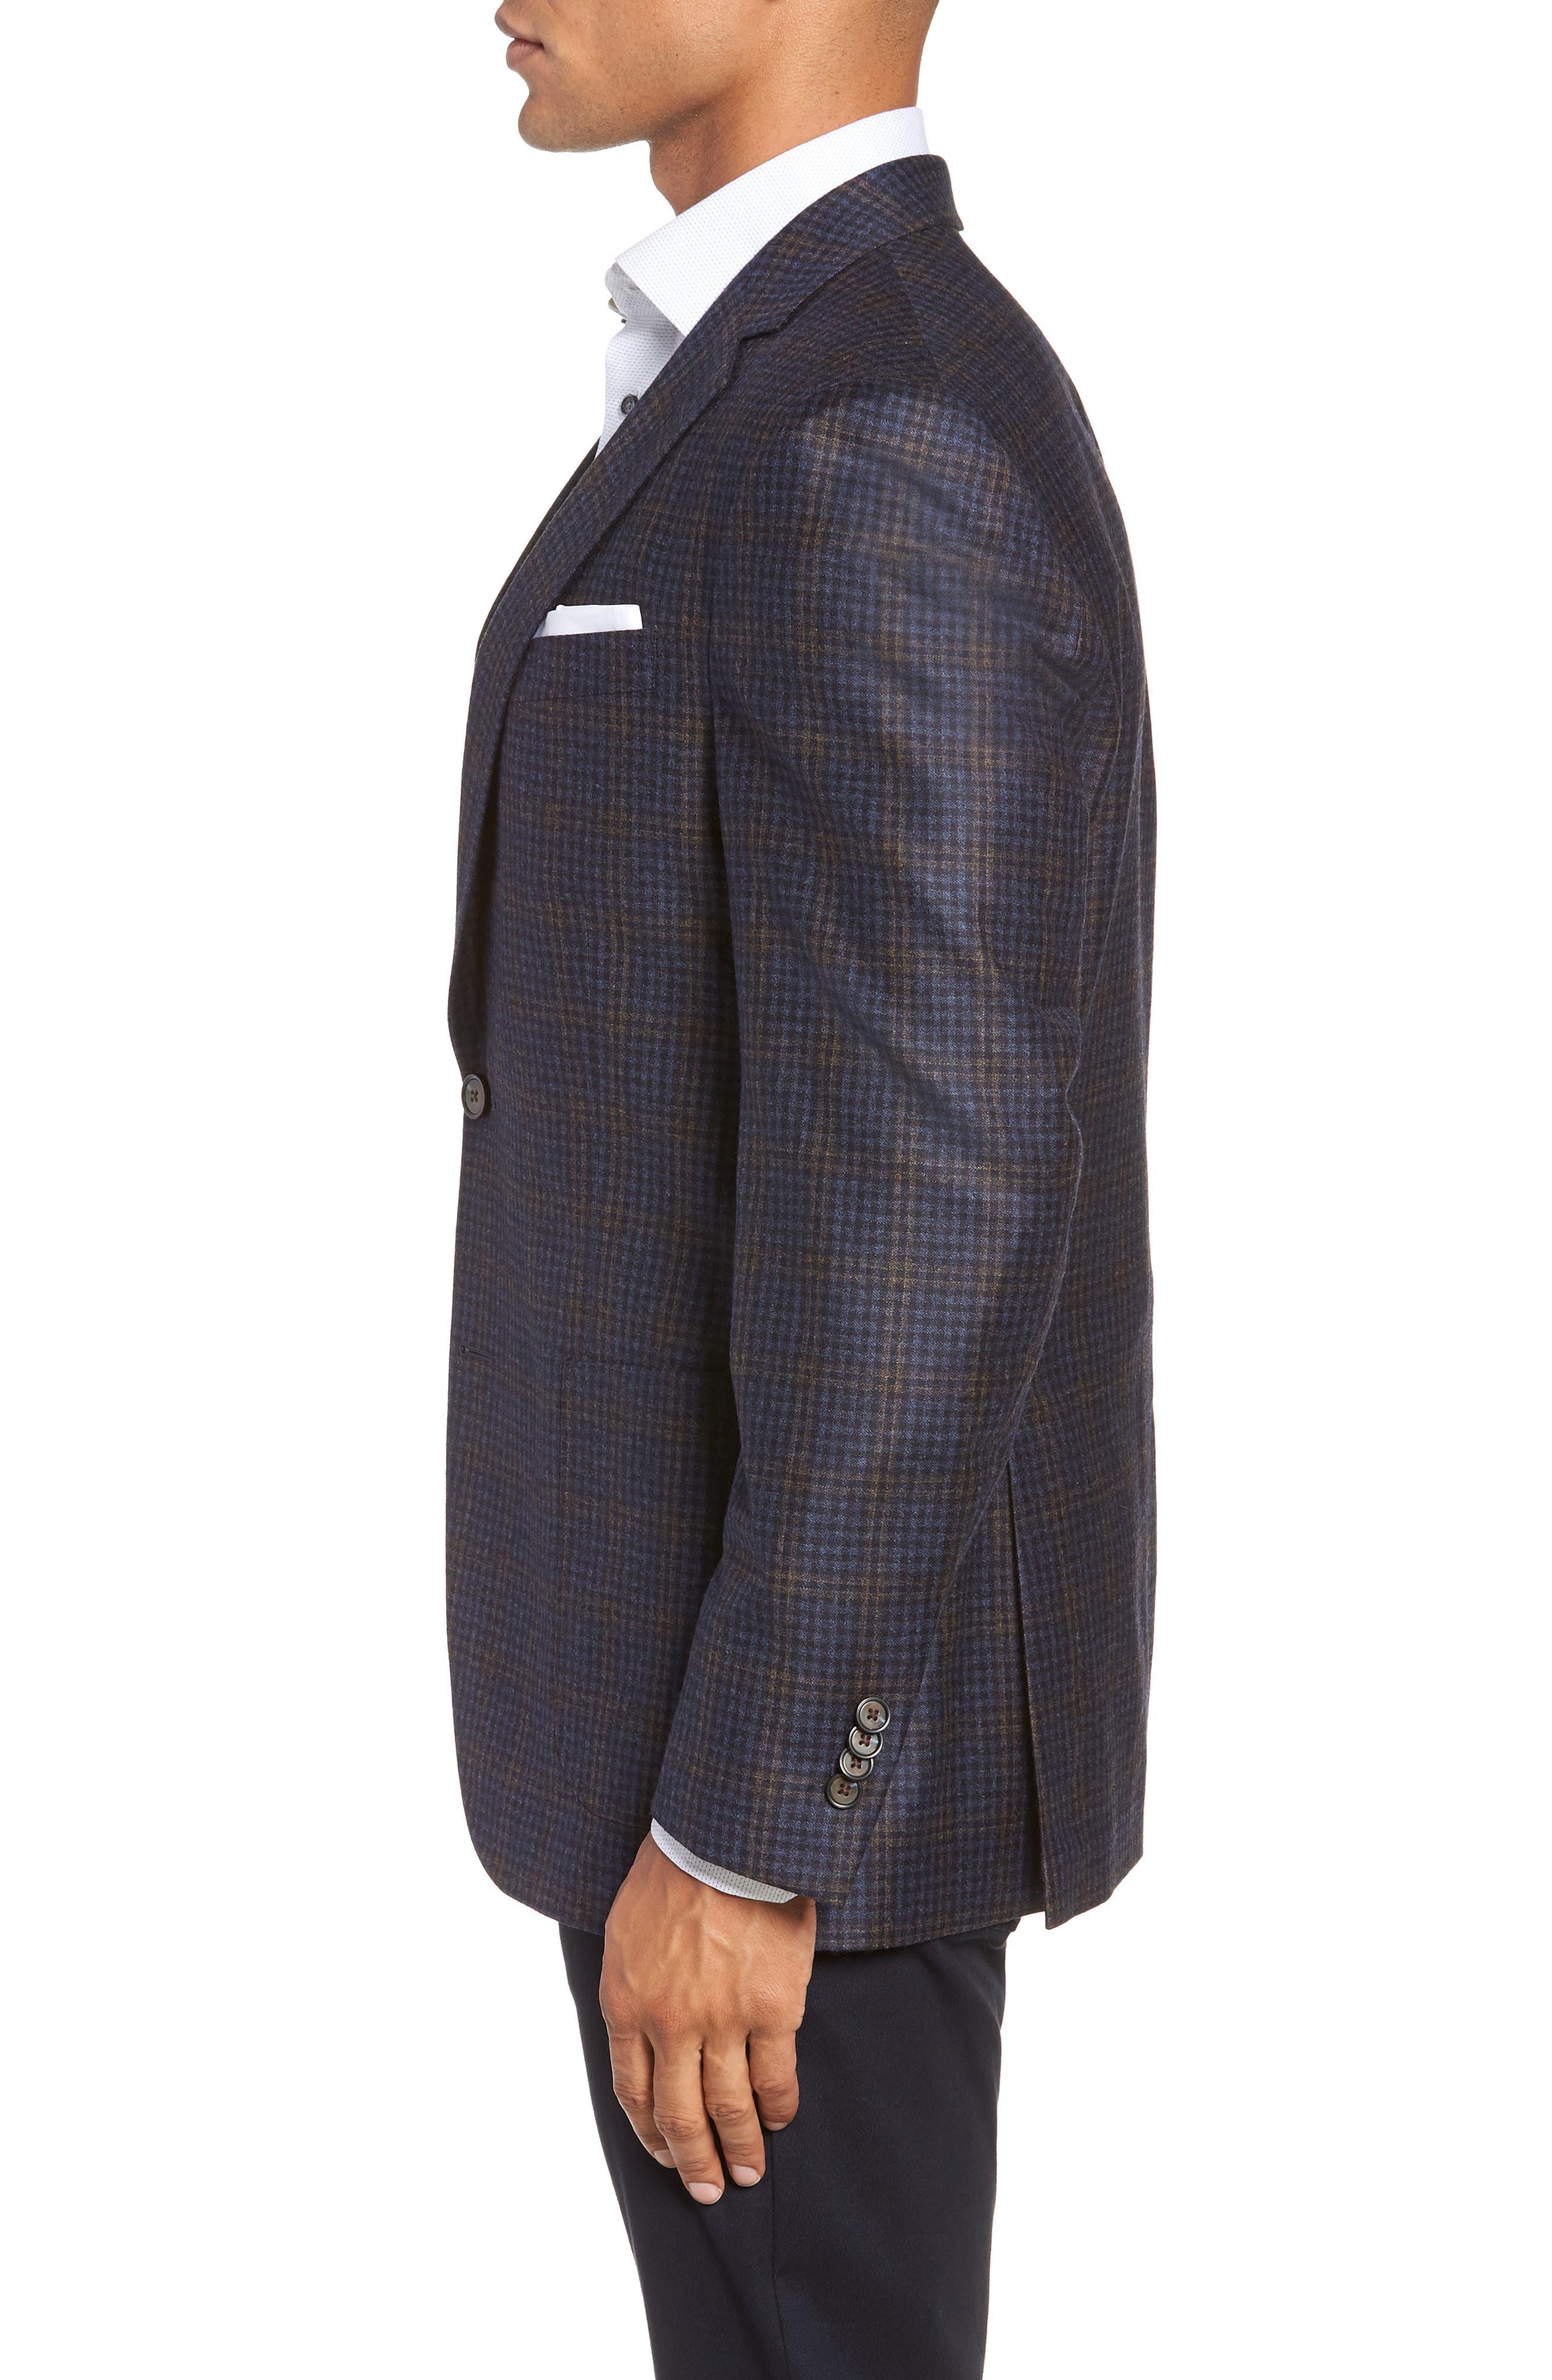 PETER MILLAR,                             Classic Fit Check Wool Sport Coat,                             Alternate thumbnail 3, color,                             NAVY